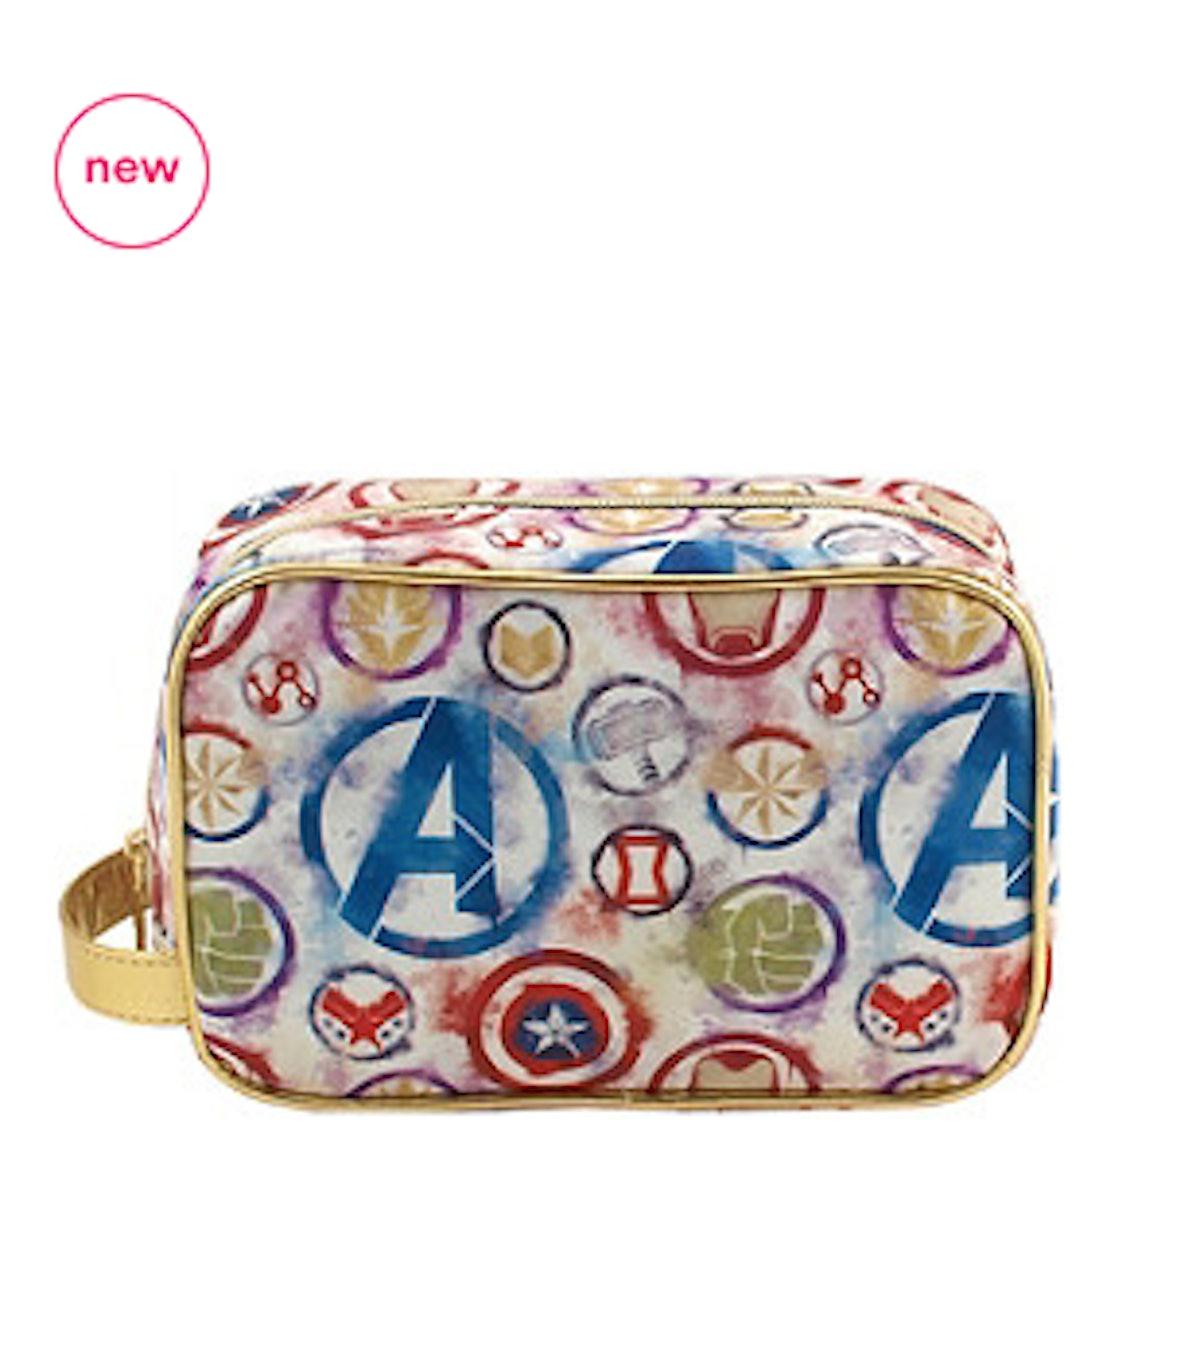 Ulta Beauty Collection x Marvel's Avengers Organizer